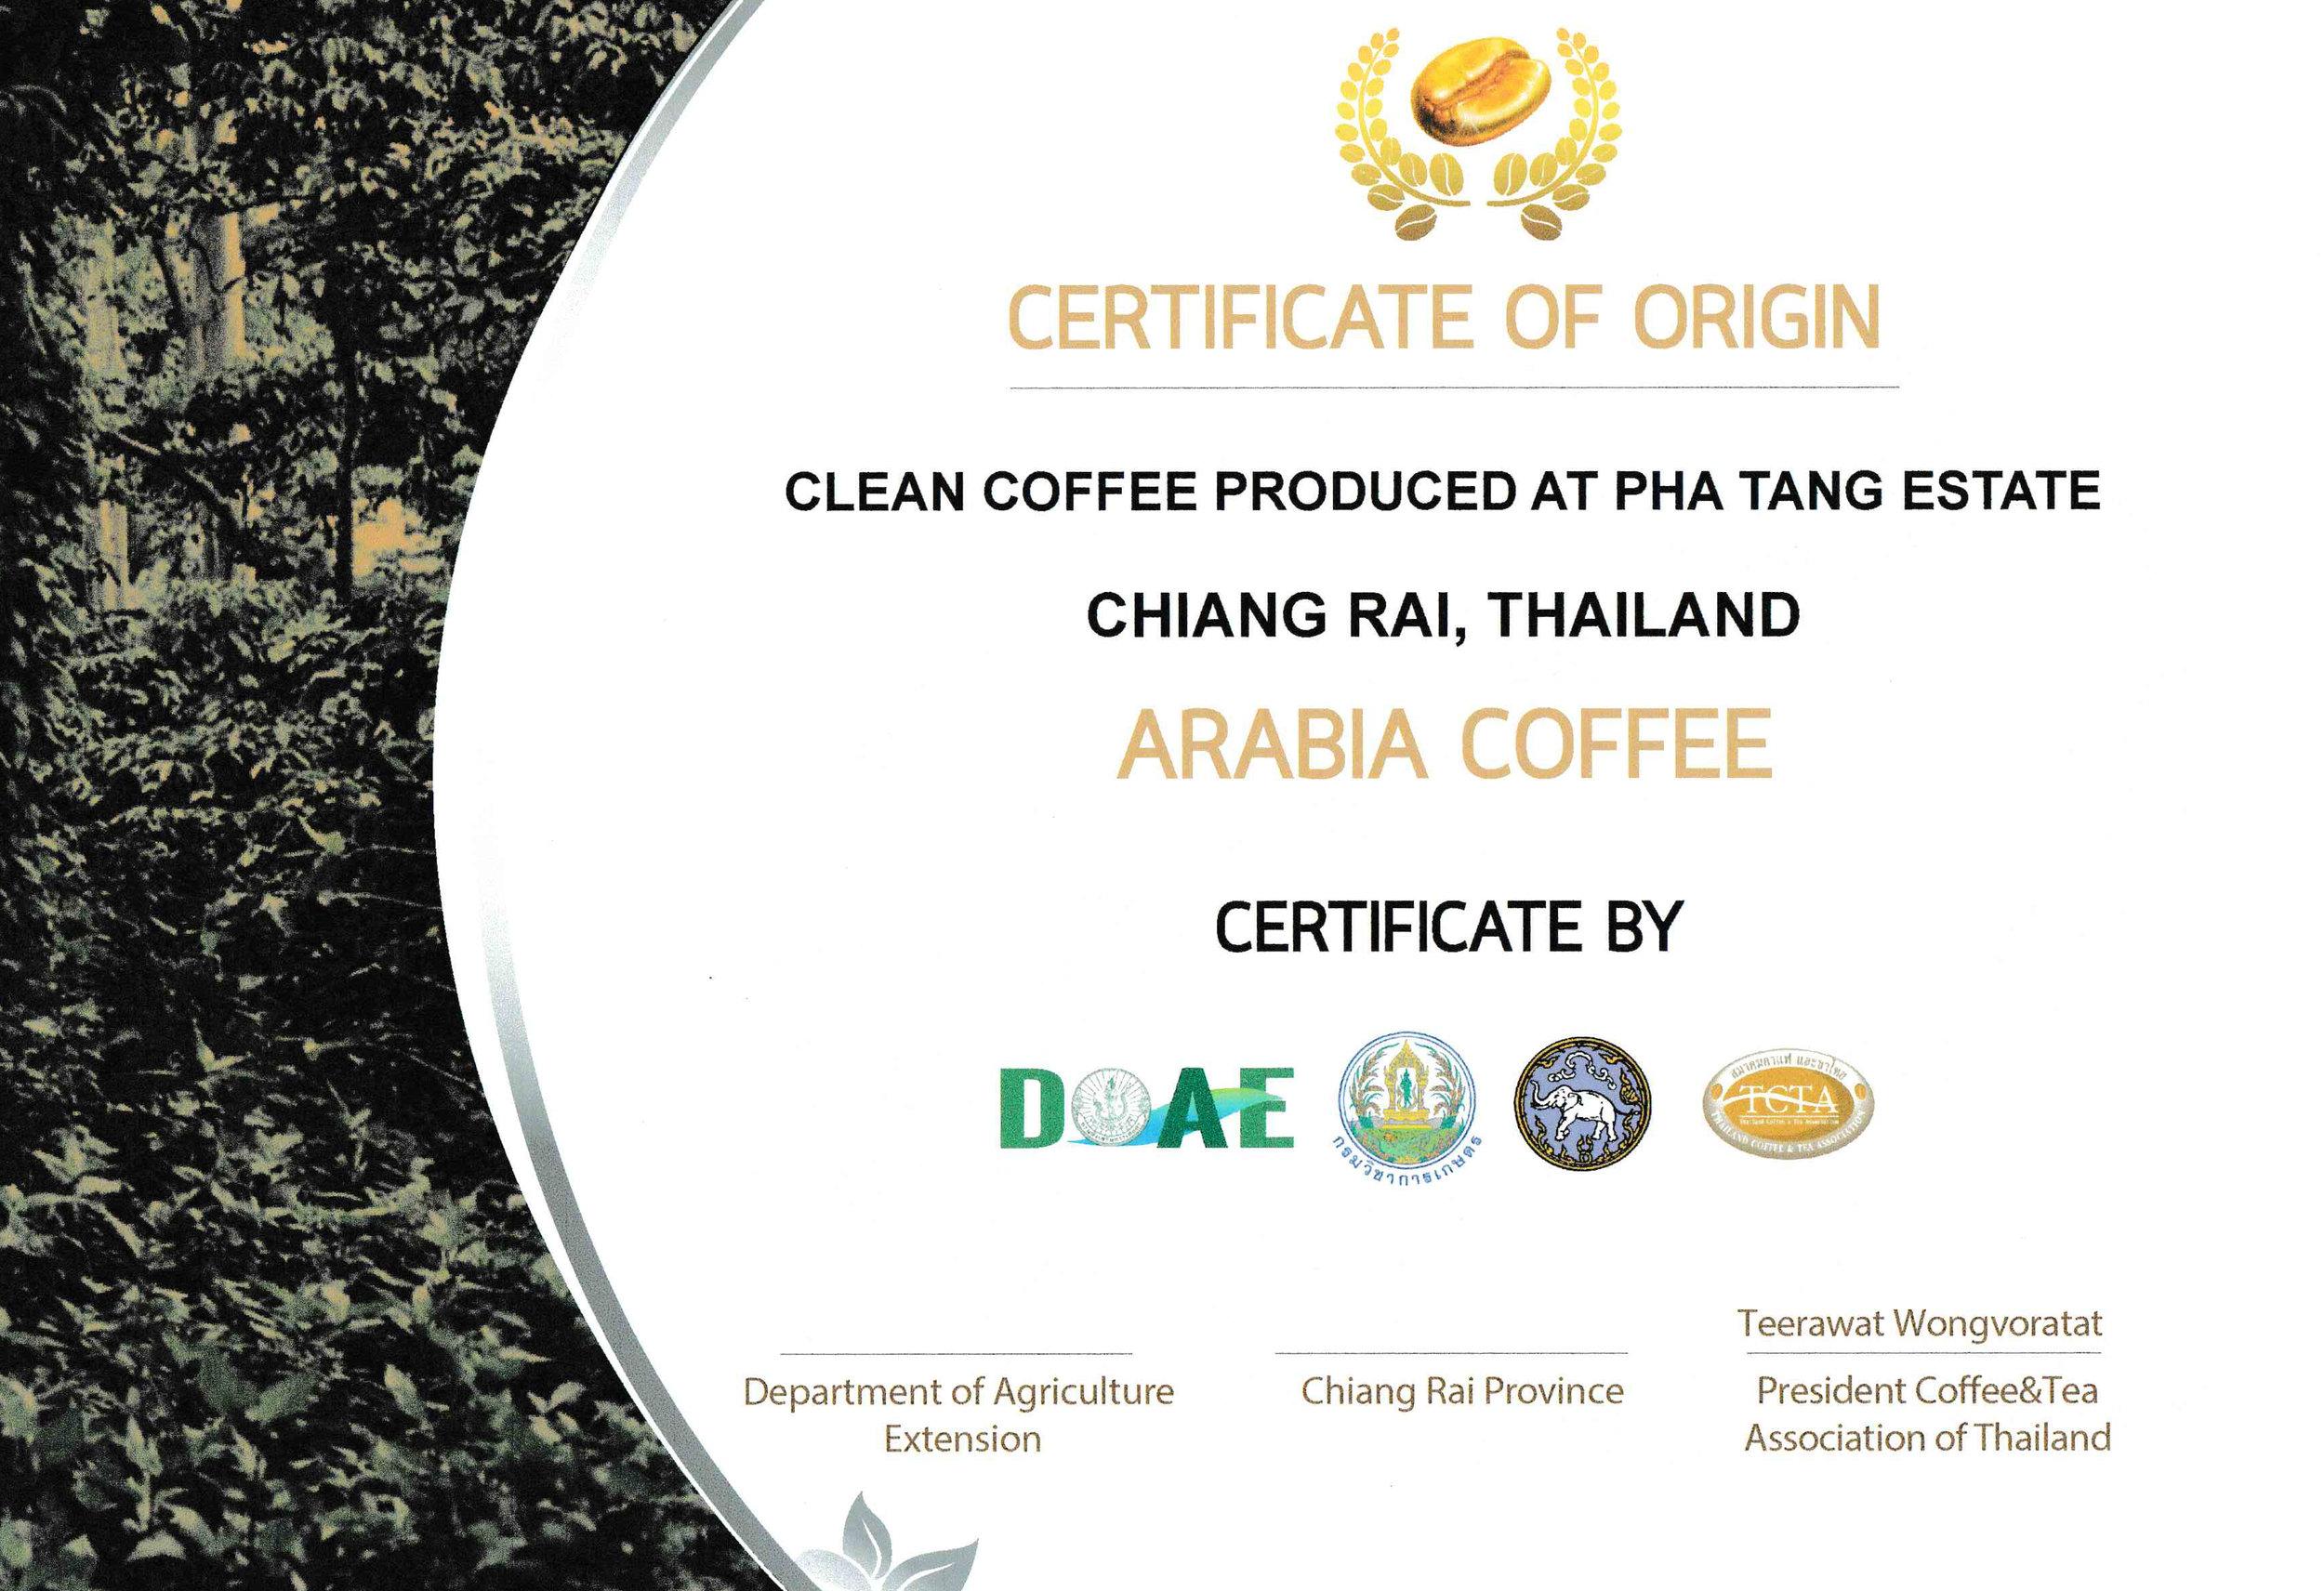 certificate of origin - CLEAN COFFEE PRODUCED AT PHA TANG ESTATE